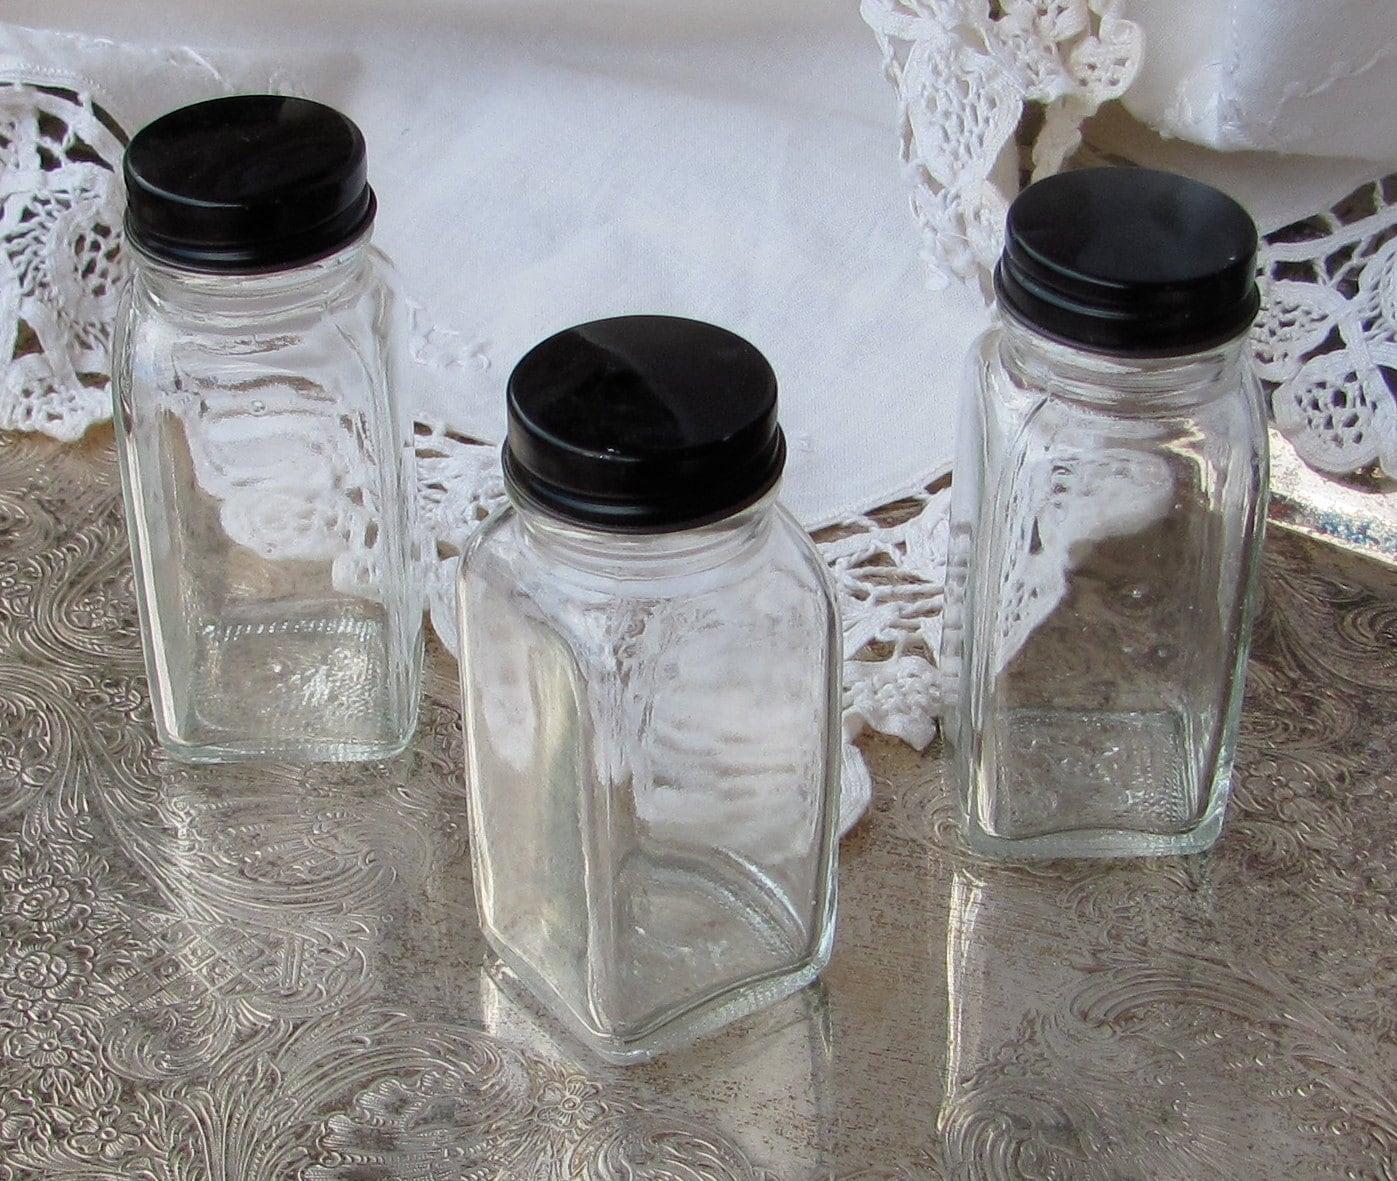 Vintage  Bottles Set of  3  By My Broken Art on Etsy